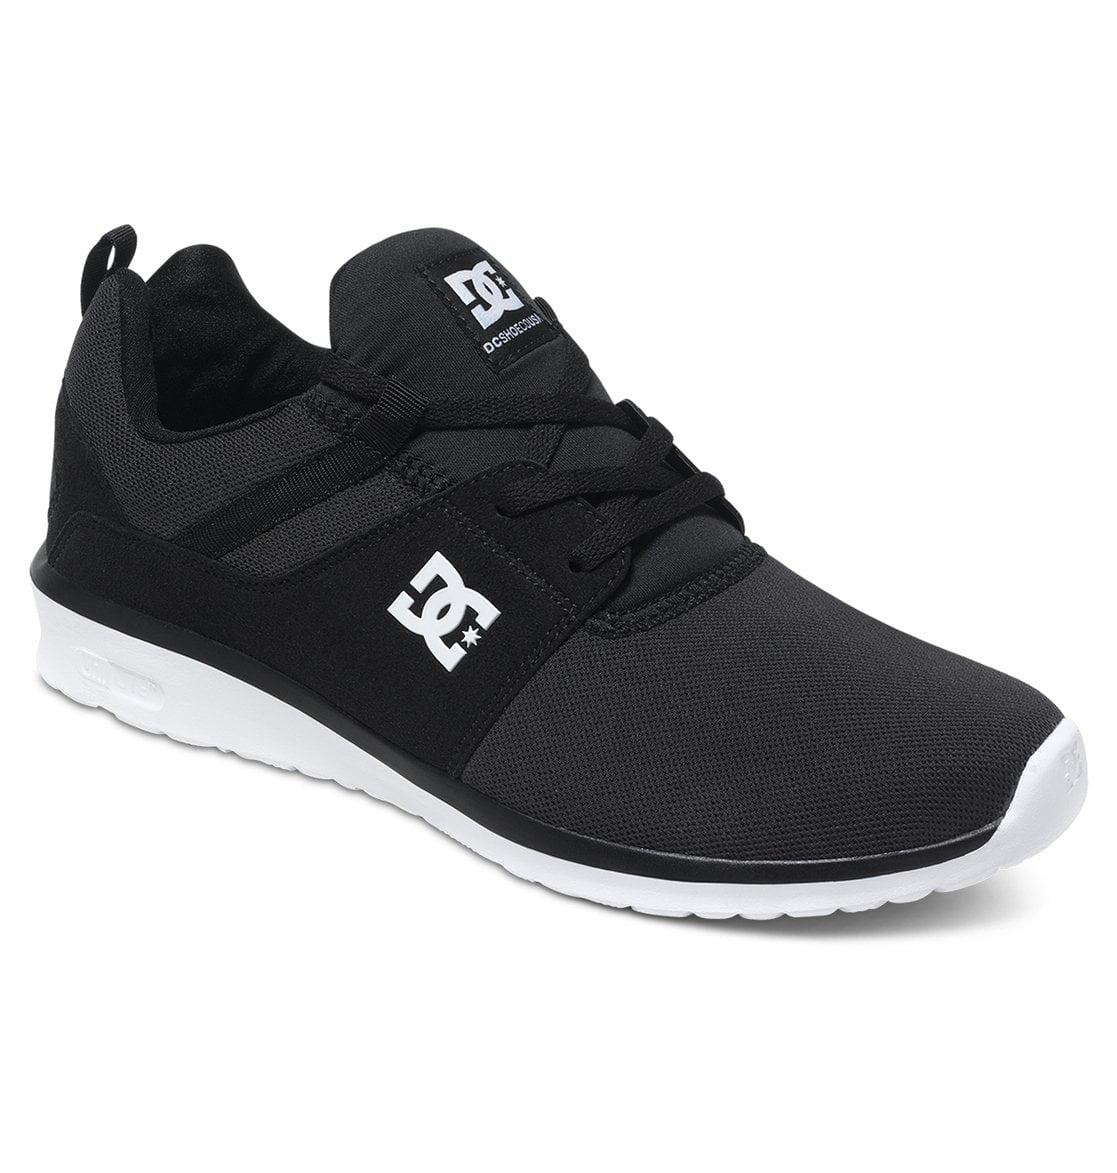 DC Mens Heathrow, Black/White, 9.4 Economical, stylish, and eye-catching shoes